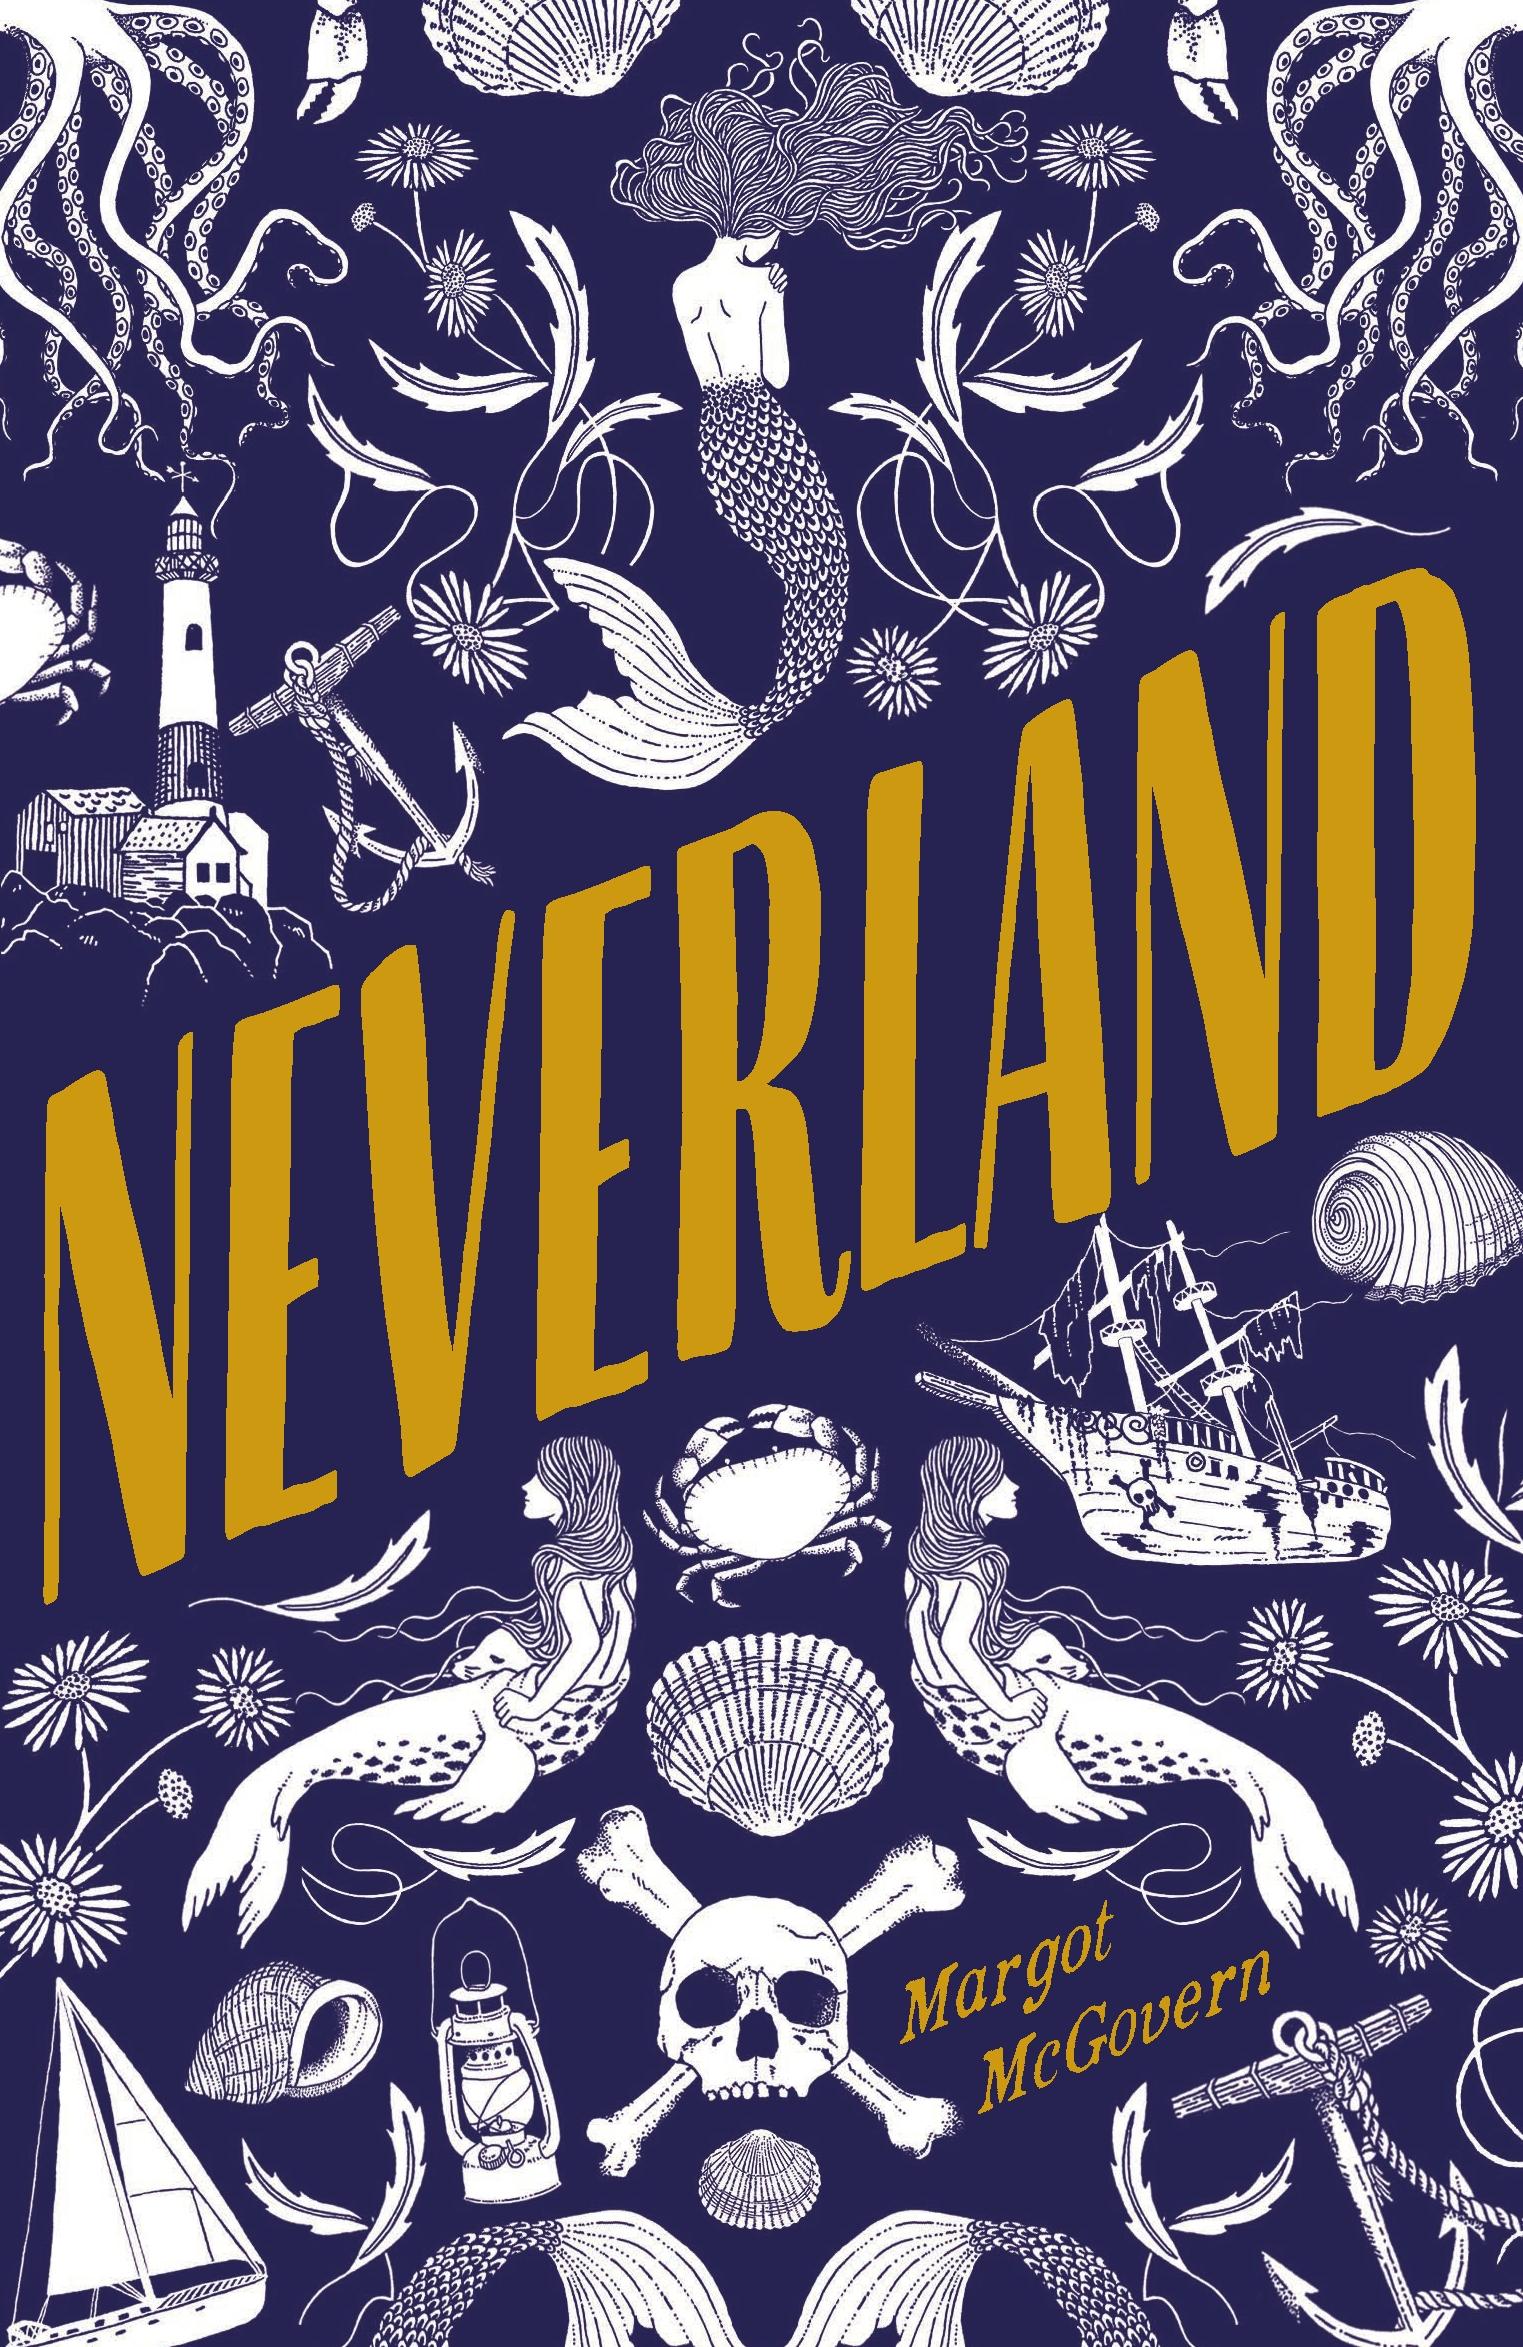 Neverland by Margot McGovern